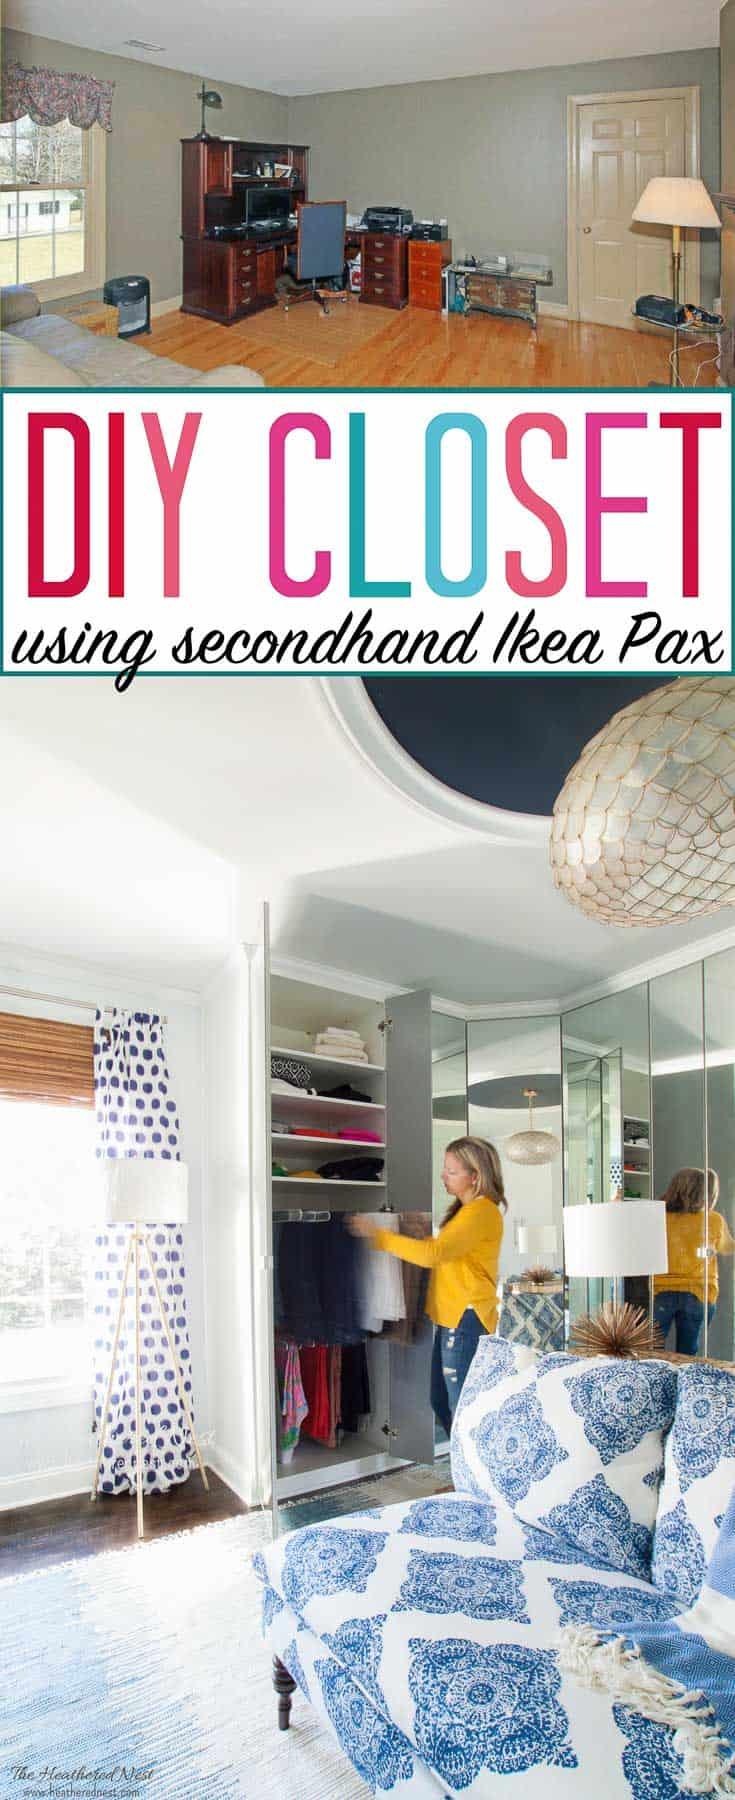 AMAZING walk-in closet design! And it's a DIY project using secondhand Ikea Pax wardrobe system! BEAUTIFUL. LOVE the handbag and shoe storage!! #DIYcloset #Ikeaclosethack #Ikeaclosetsystem #DIYclosetideas #DIYclosetorganization #Ikeahacks #pax #komplement